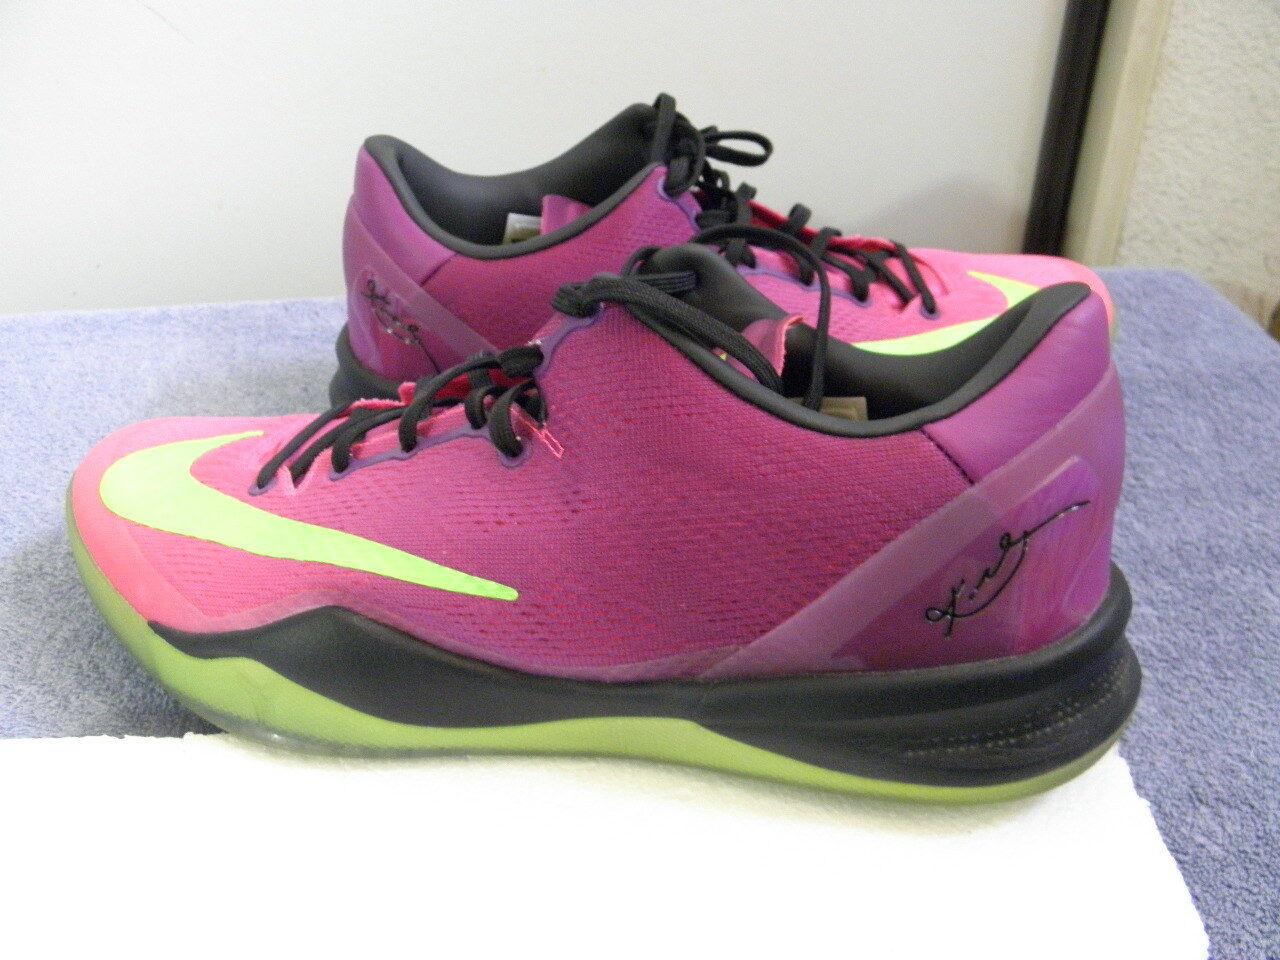 Nike kobe viii otto mamba mambacurial taglia 11 vnds bryant volubile ronaldo